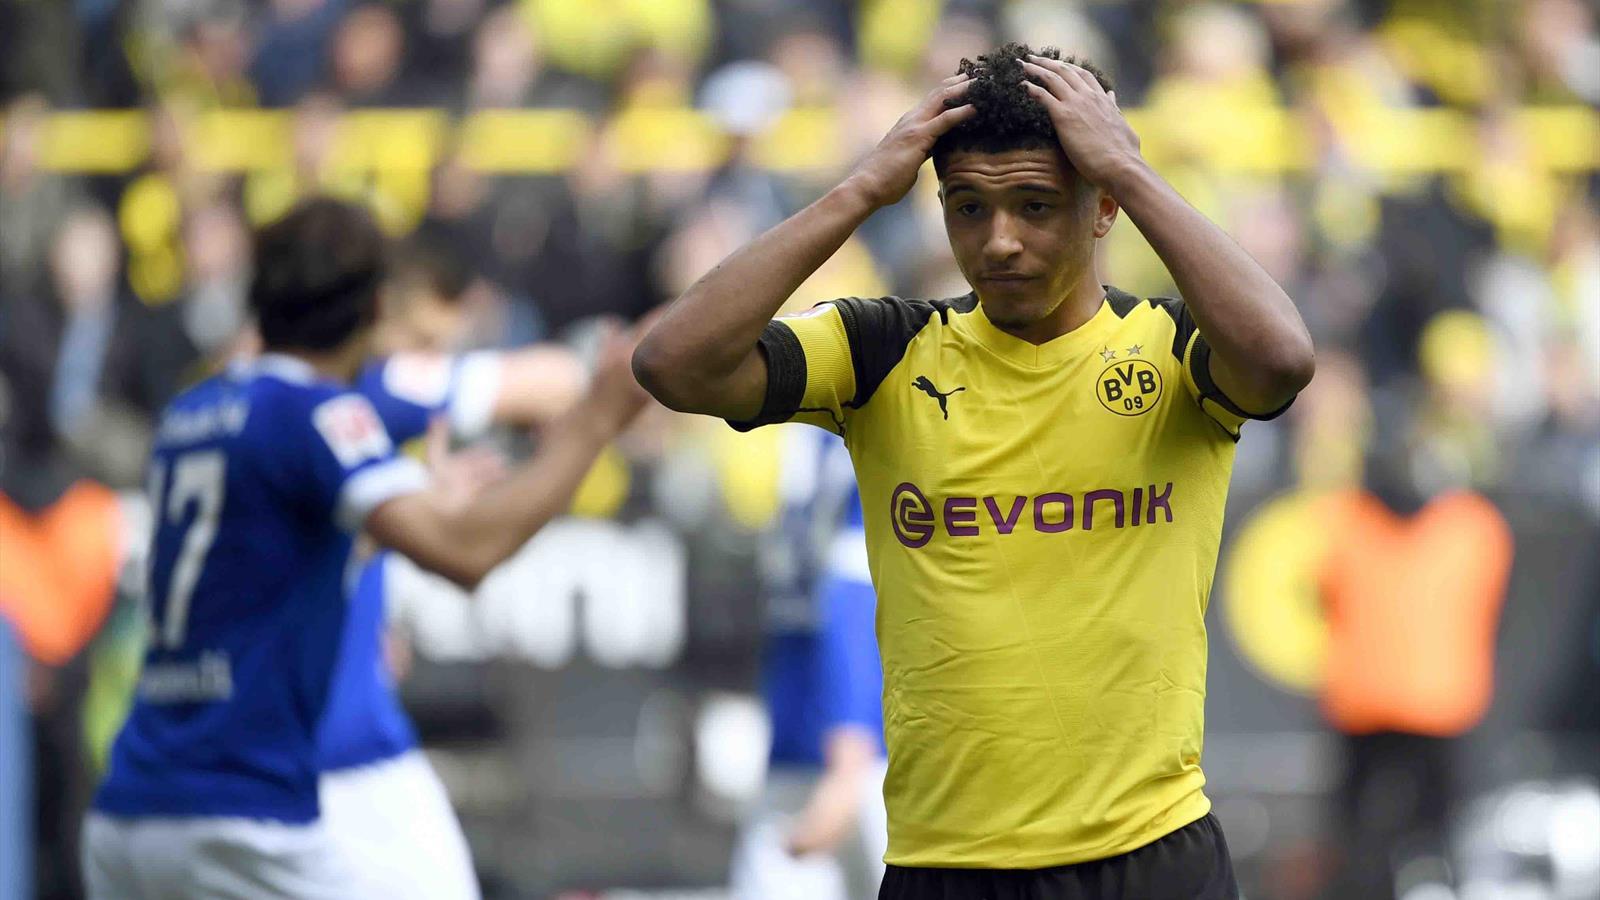 Borussia Dortmund - FC Schalke 04 live - 27 aprile 2019 - Eurosport